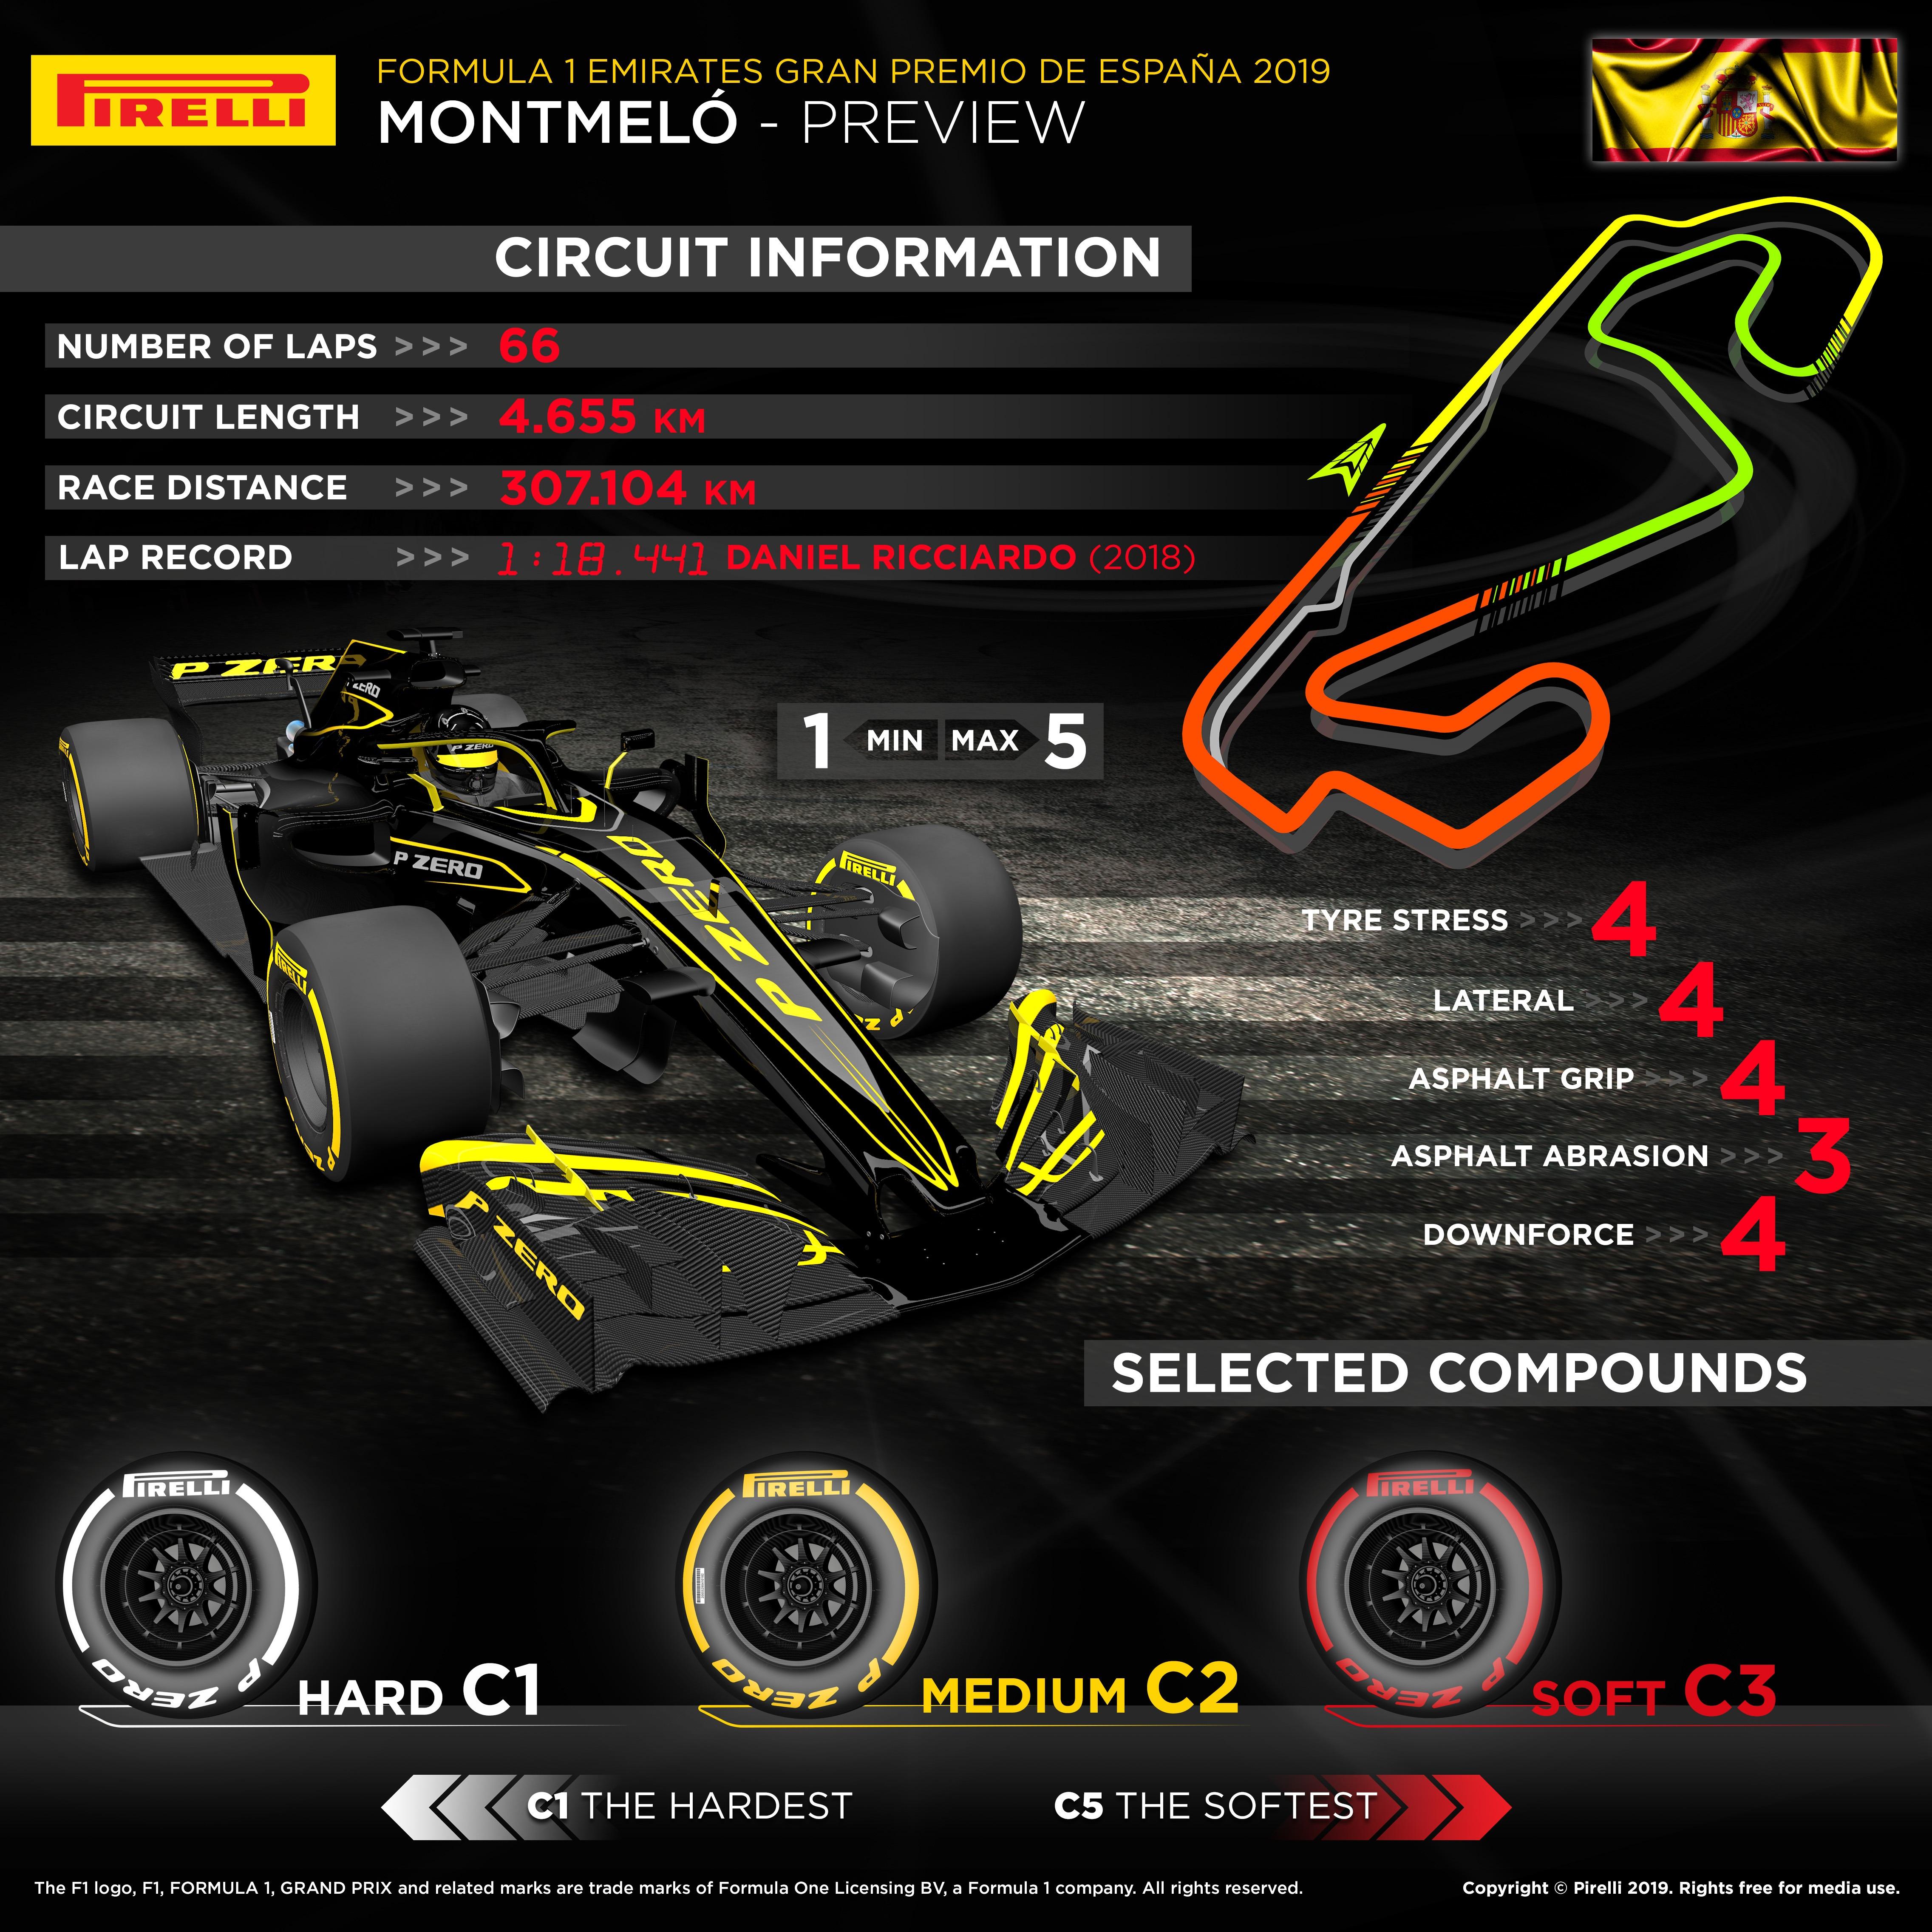 2019 Spanish F1 GP infographic